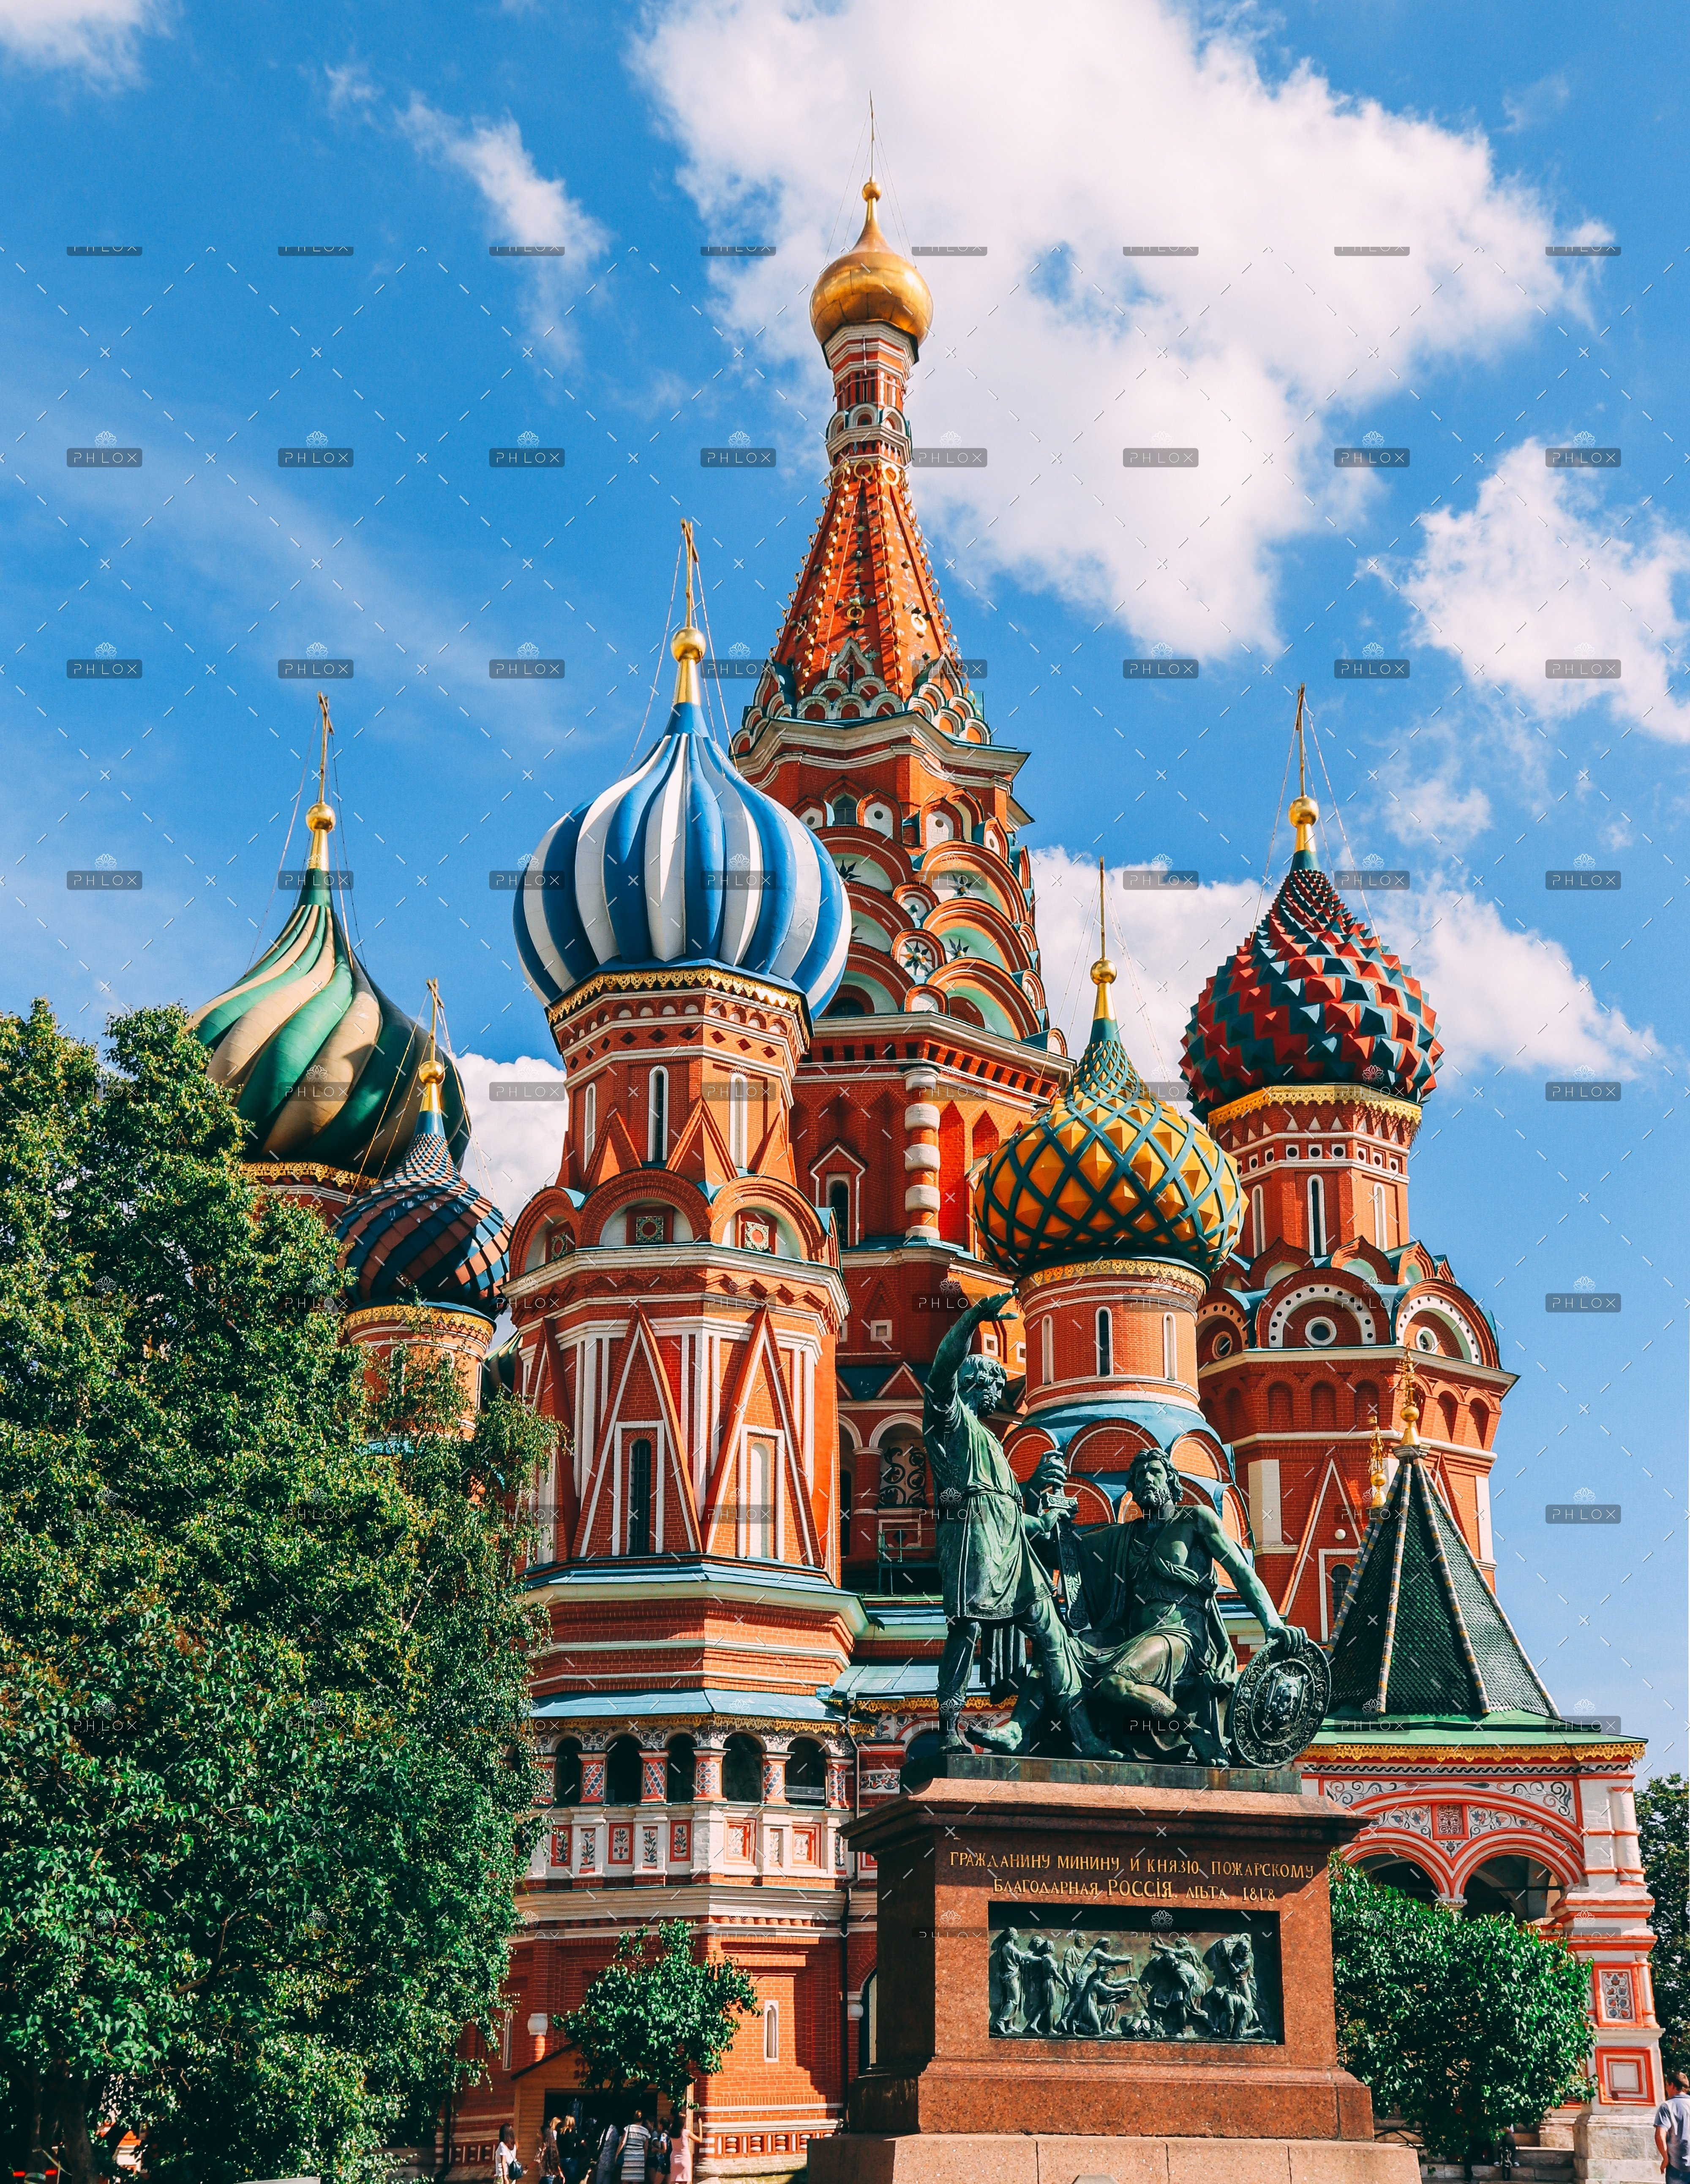 demo-attachment-144-nikolay-vorobyev-481292-unsplash